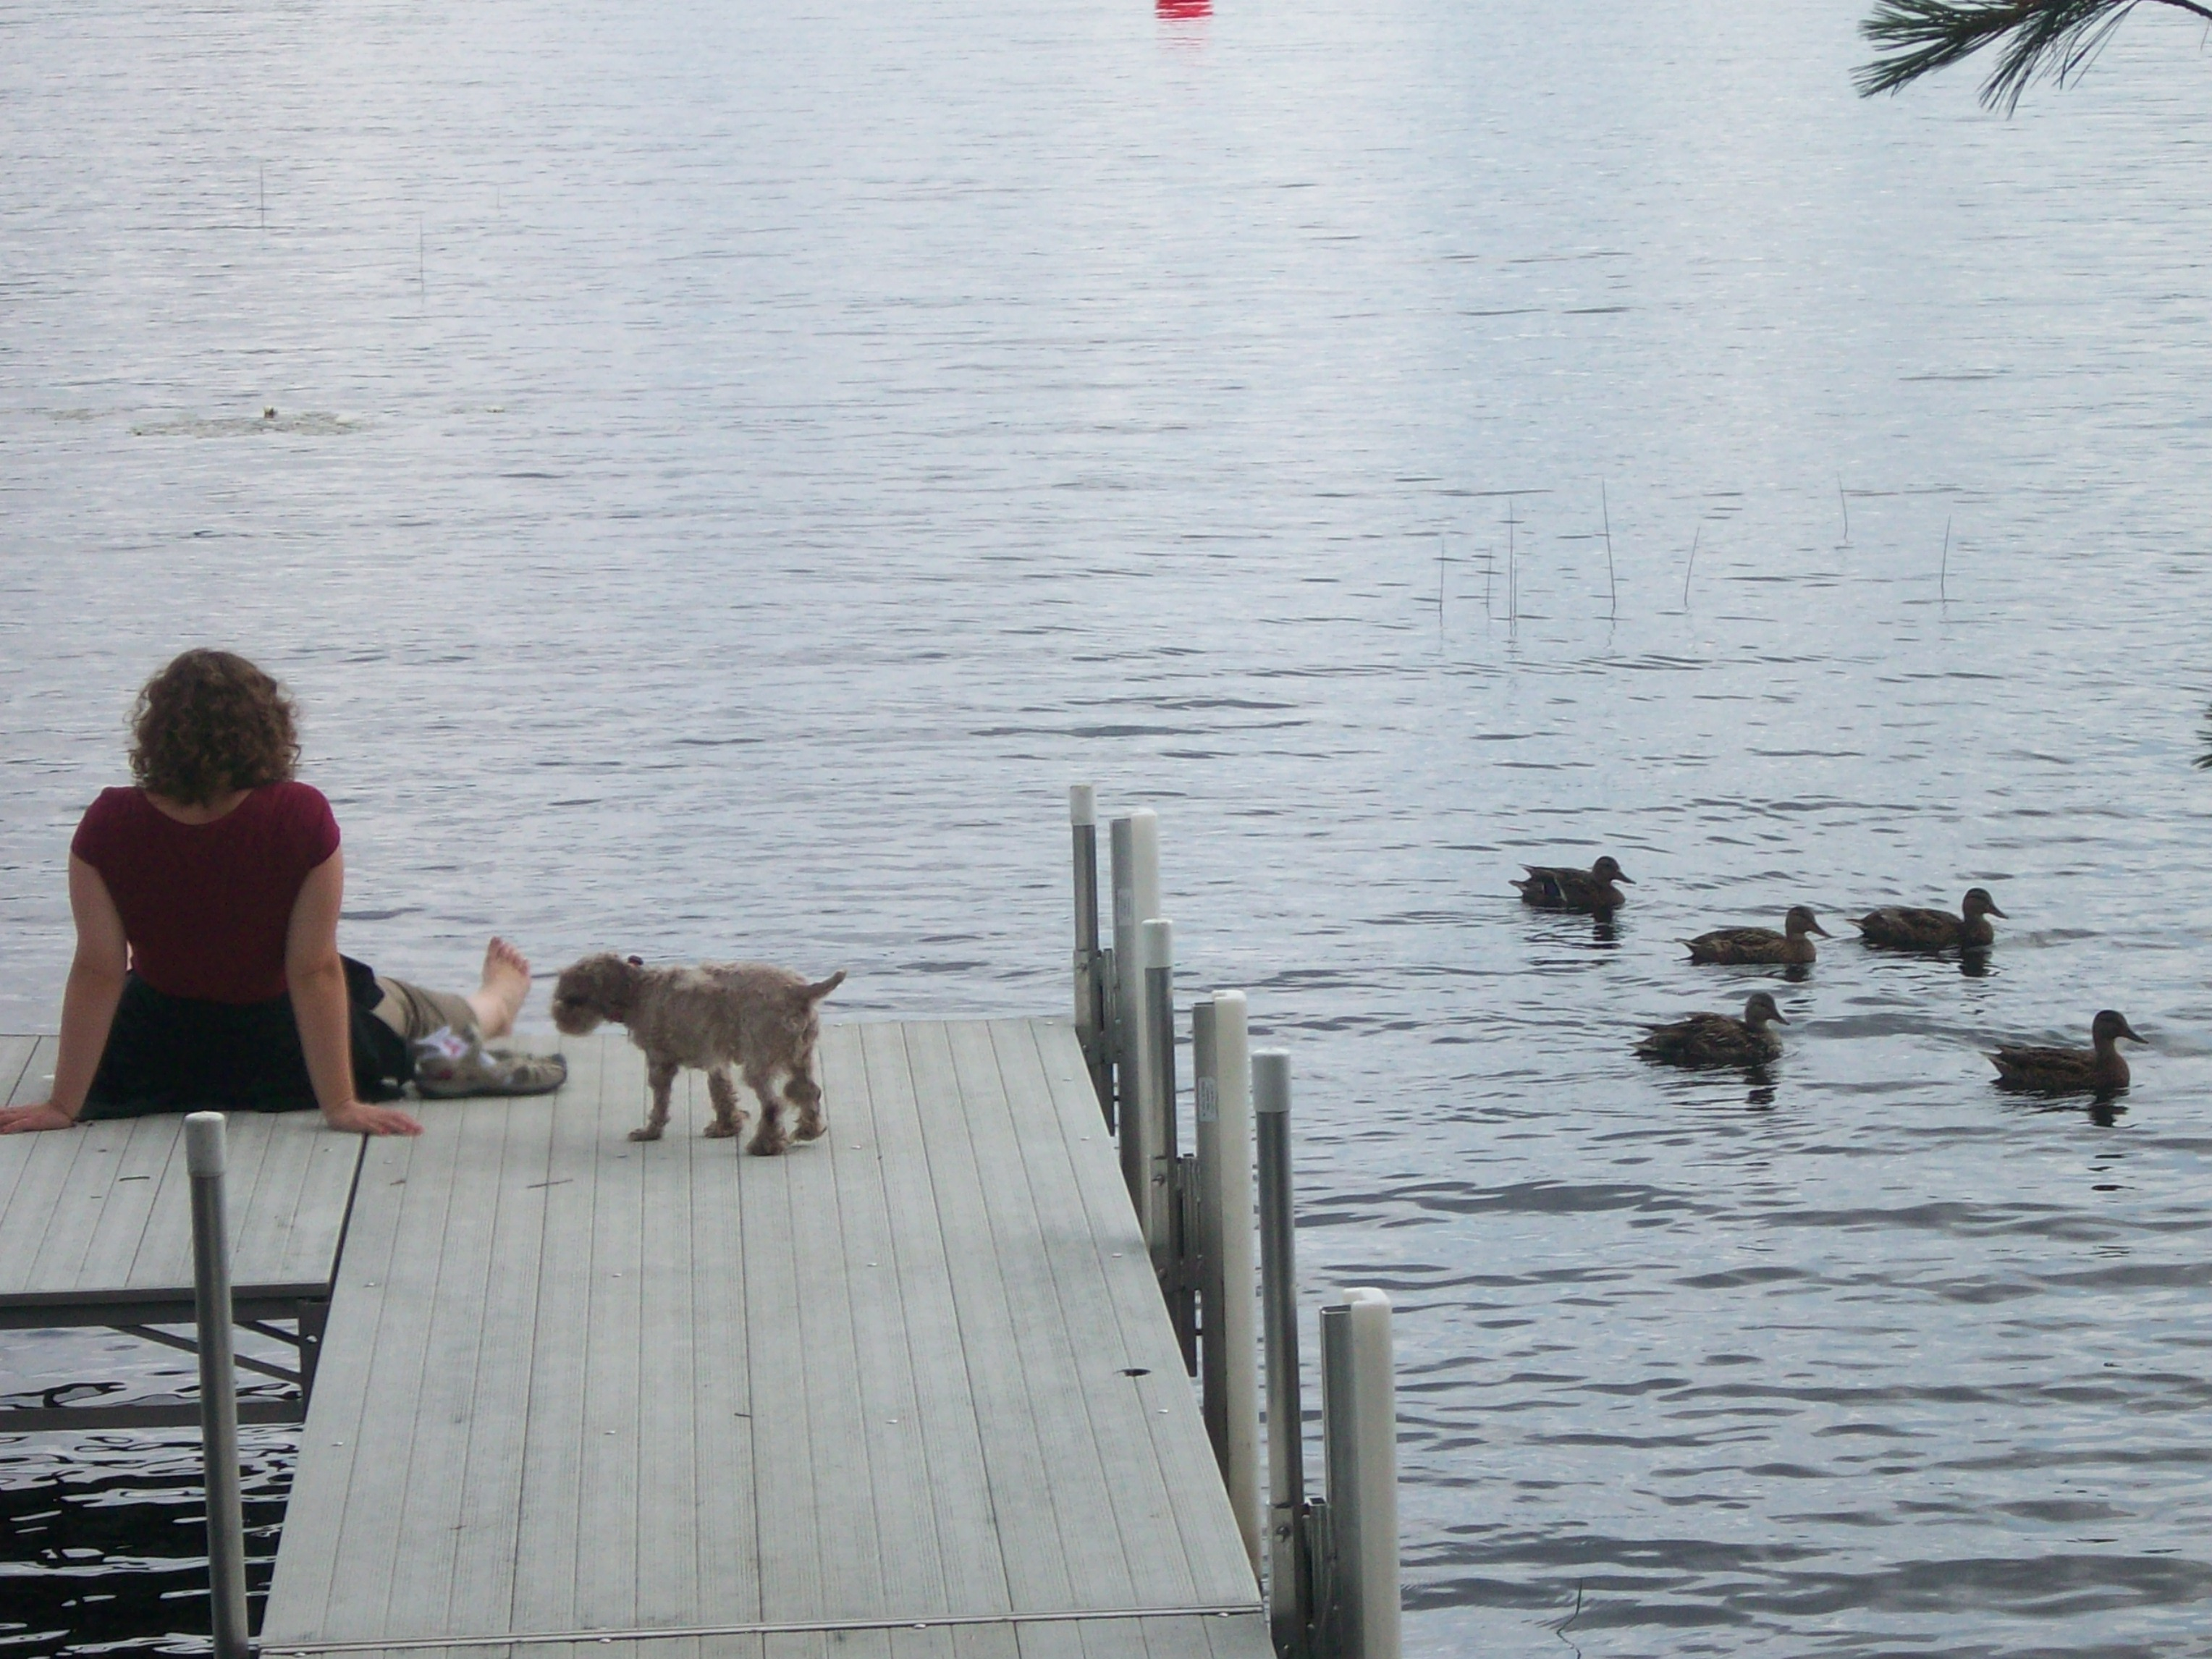 Emma, Dougal, and ducks